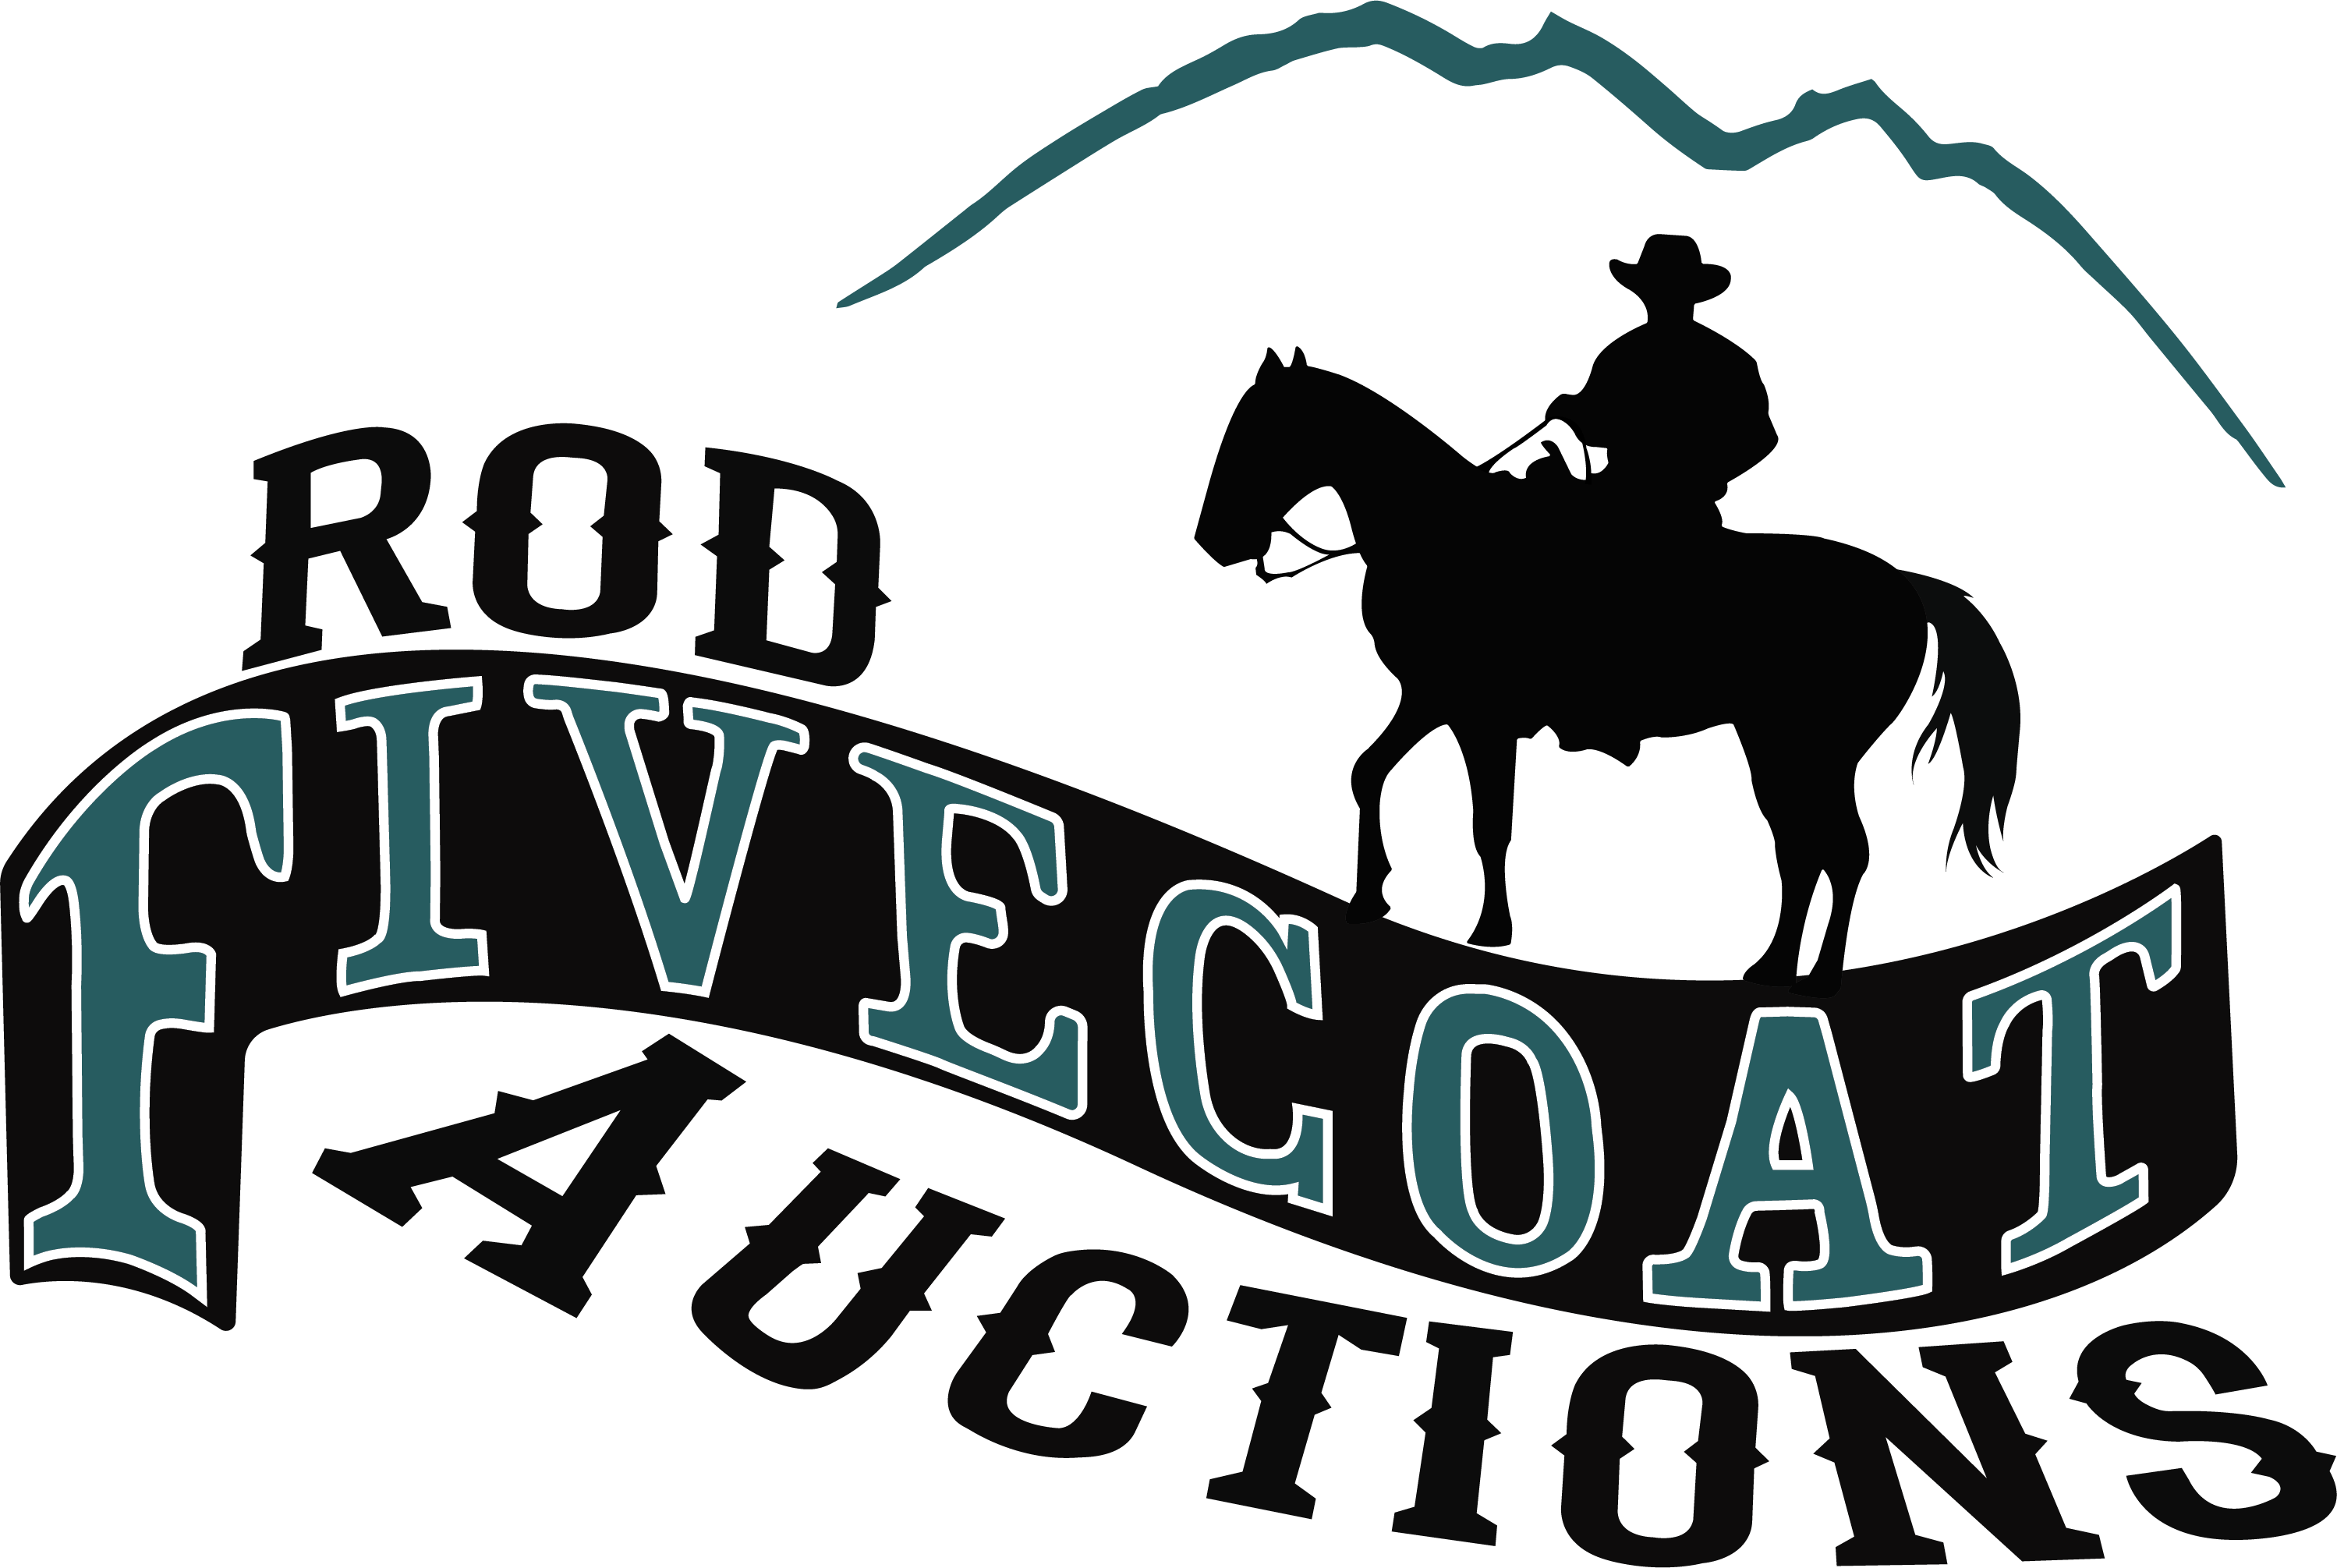 Rod Fivecoat Auctions Logo